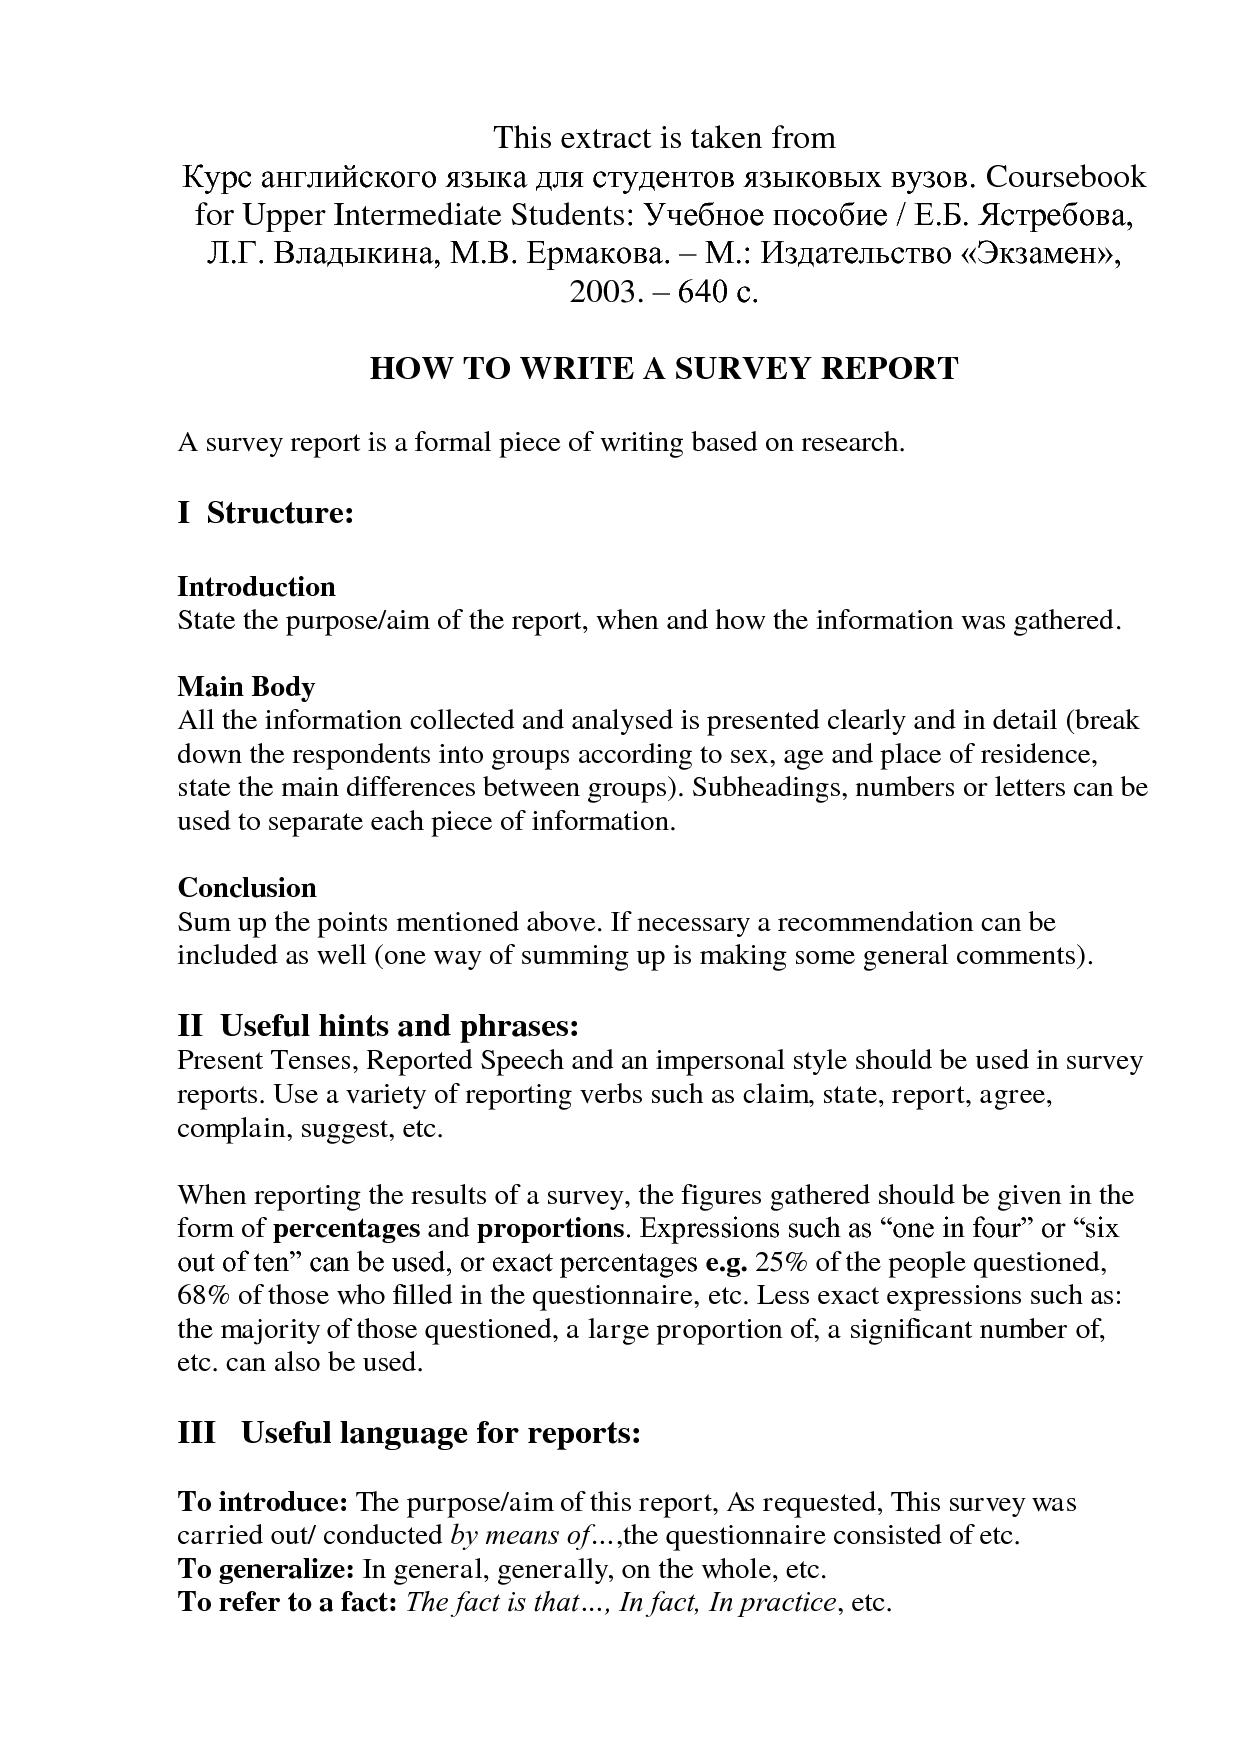 How To Write A Survey Report